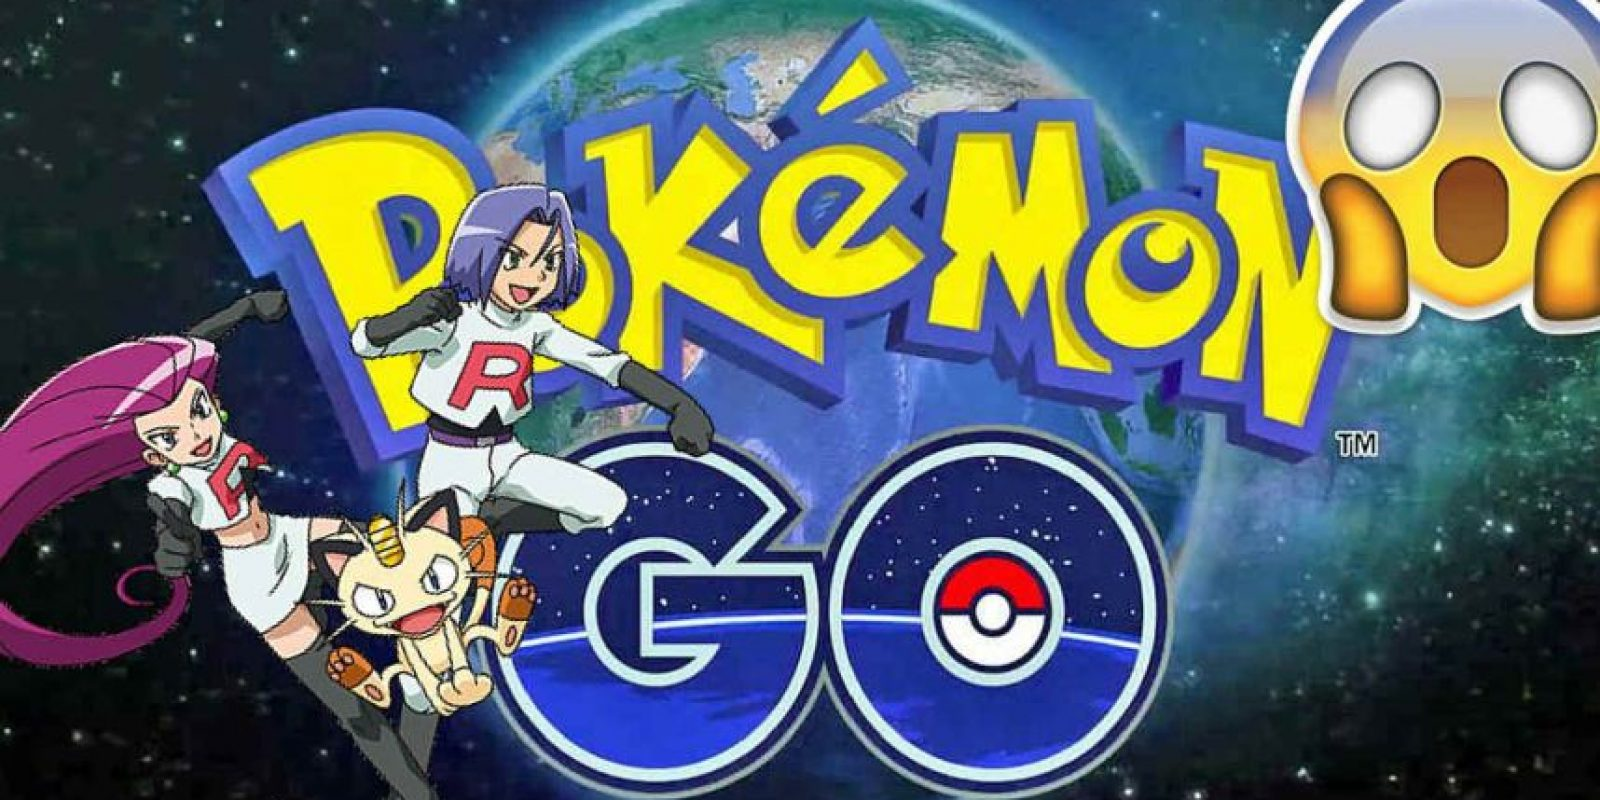 Pokémon Go es un popular juego para celulares. Foto:Pokémon Go